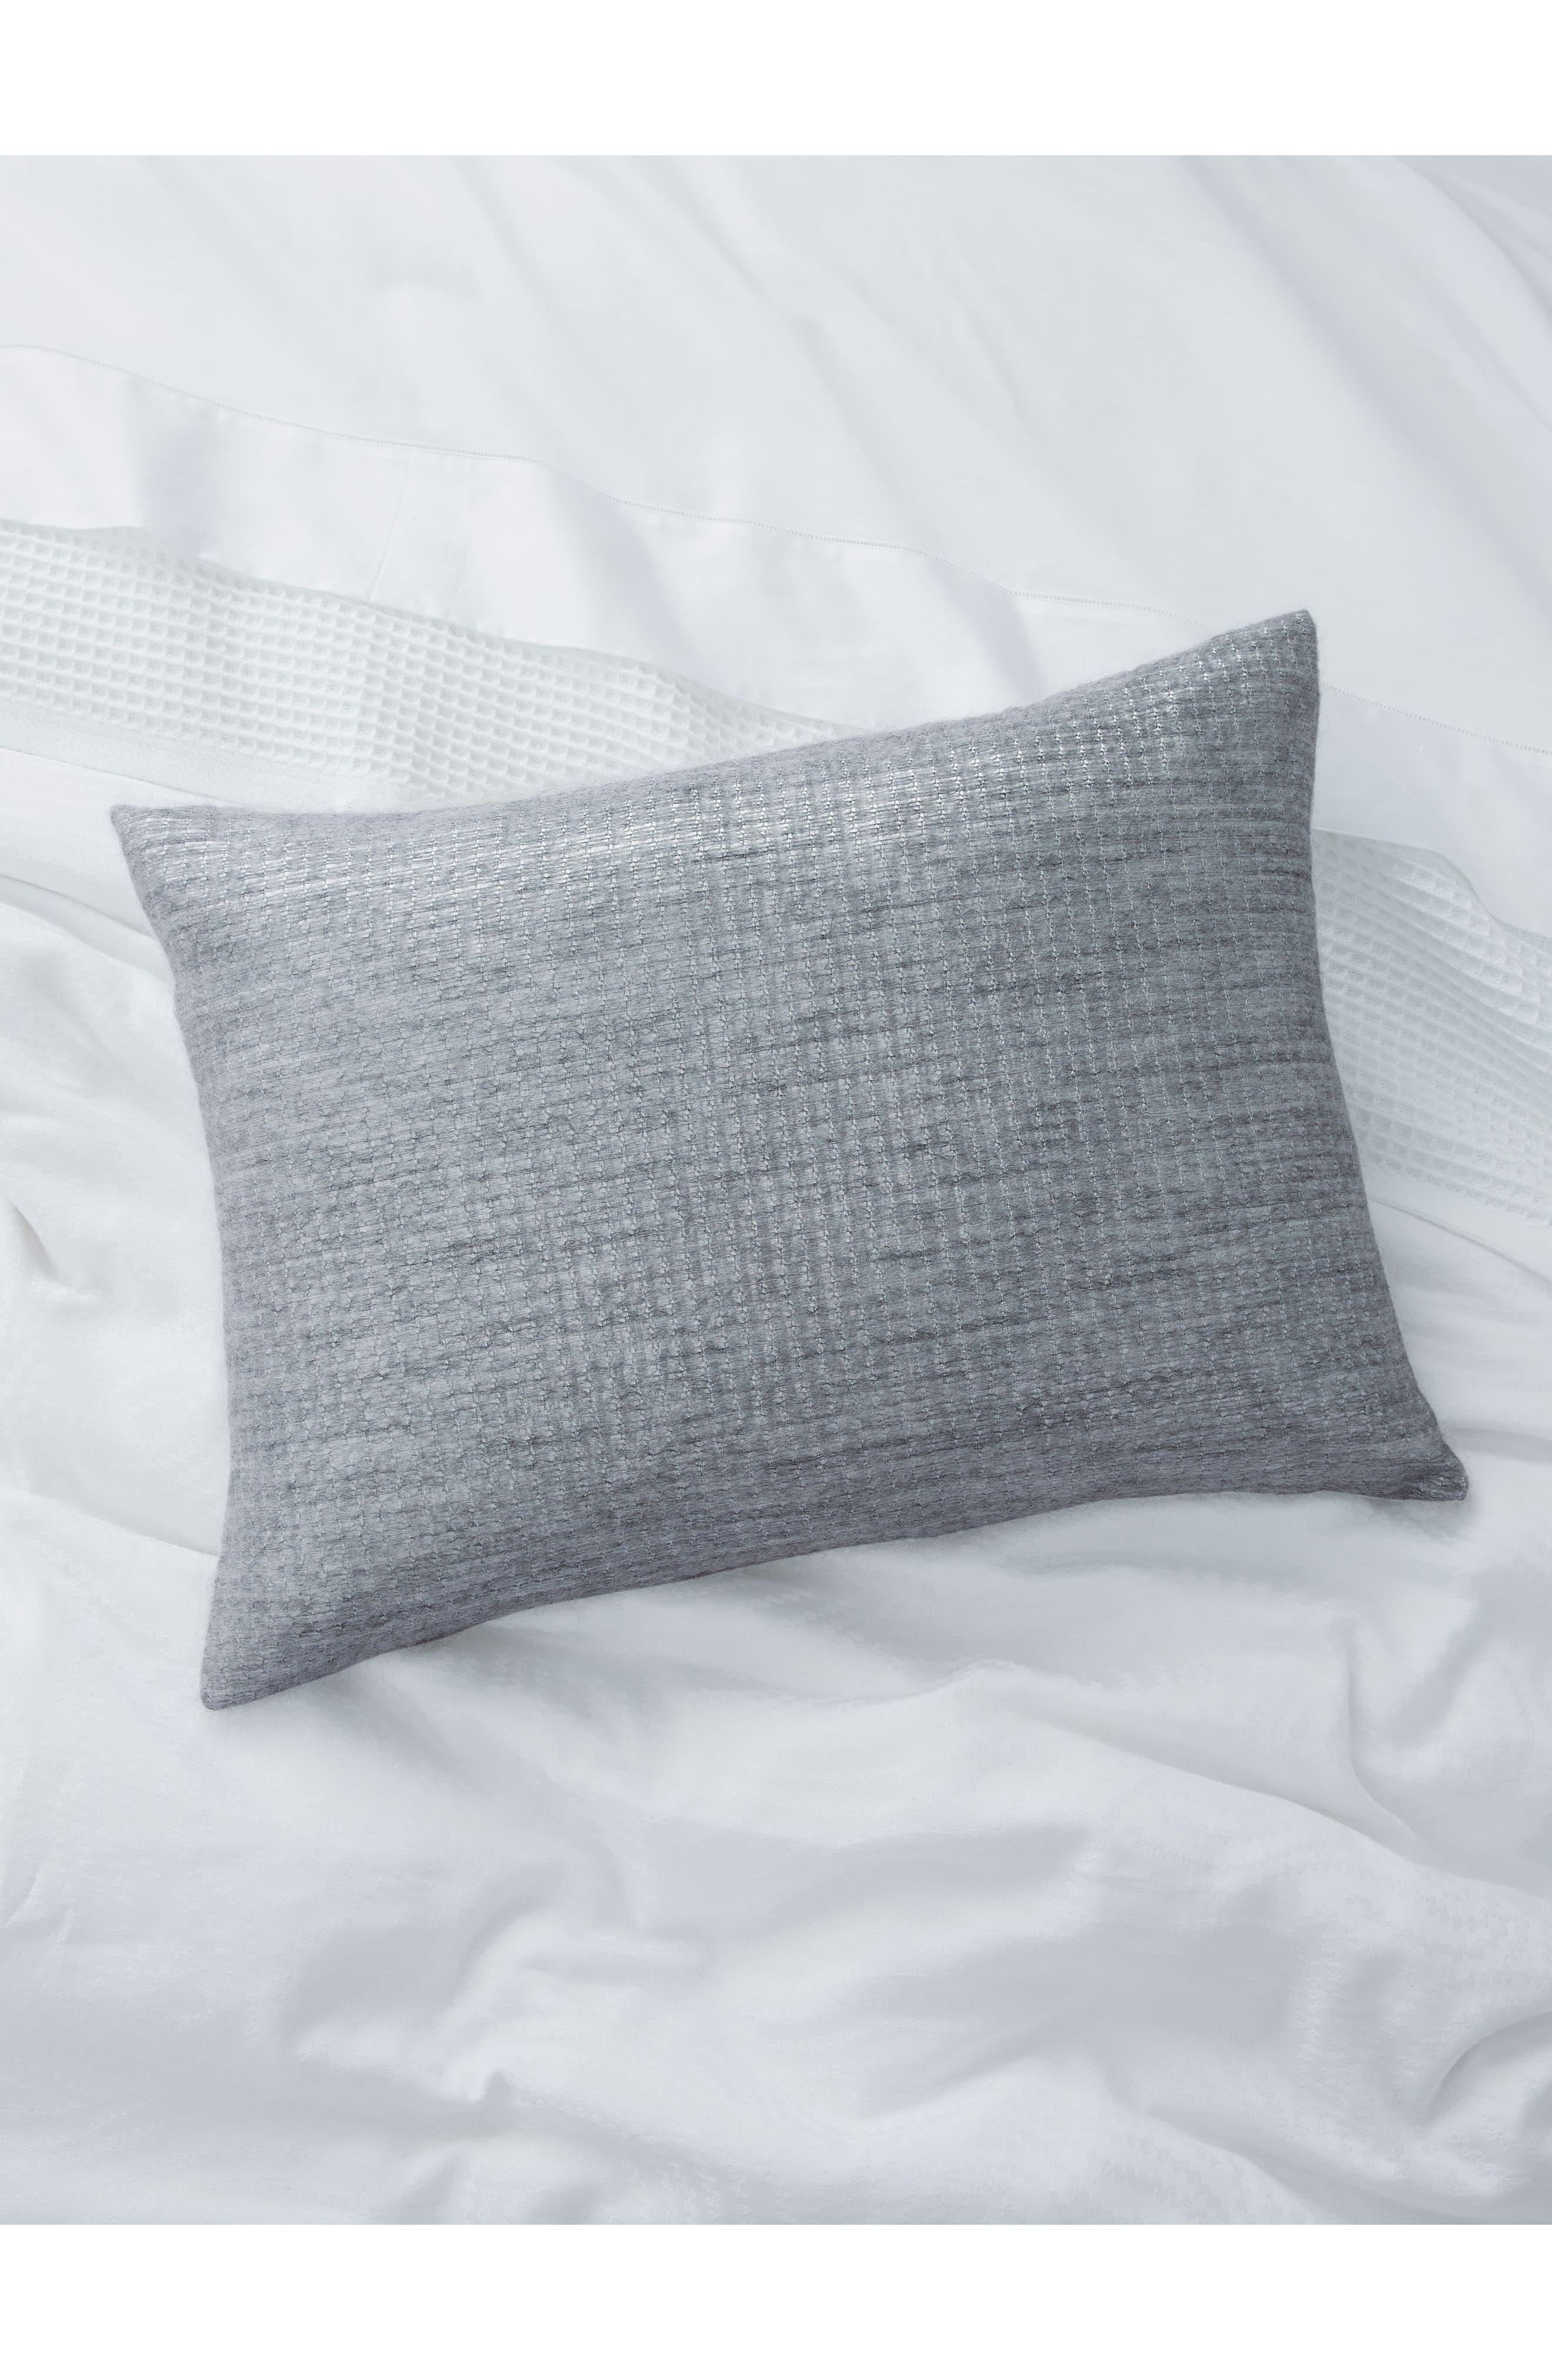 Fonta Accent Pillow,                             Alternate thumbnail 2, color,                             045